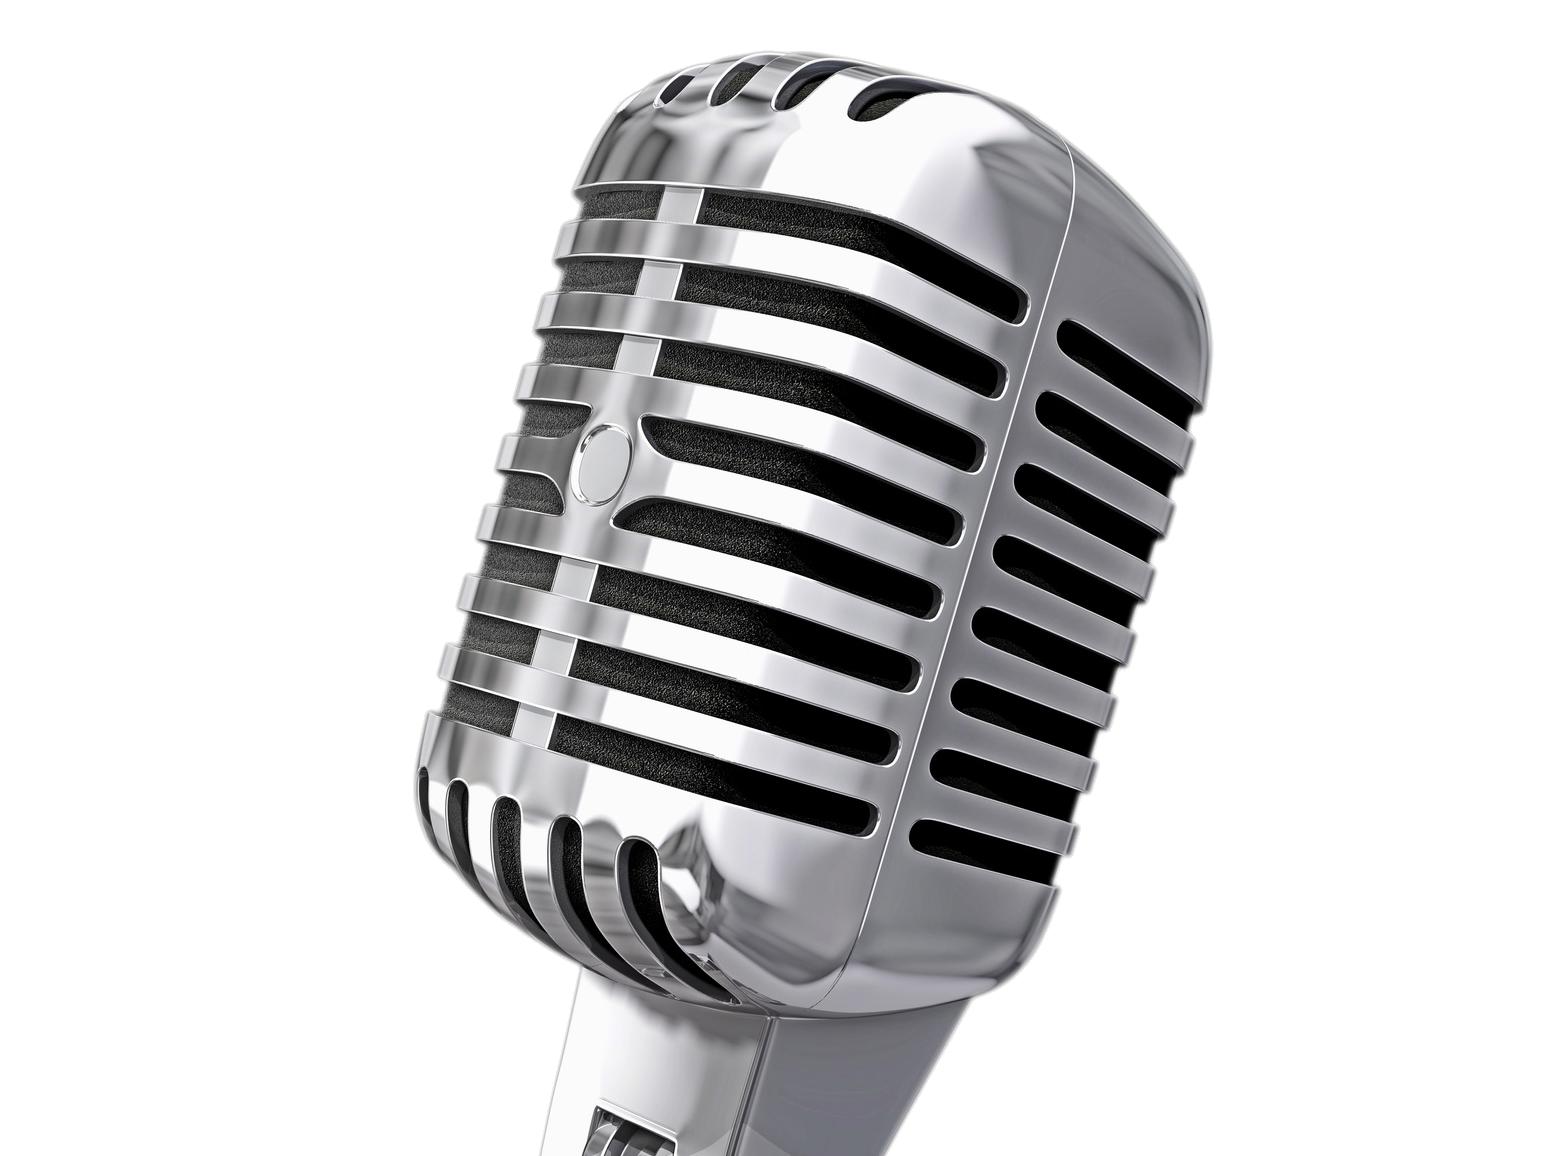 Microphone png image free. Clipart studio mircophone